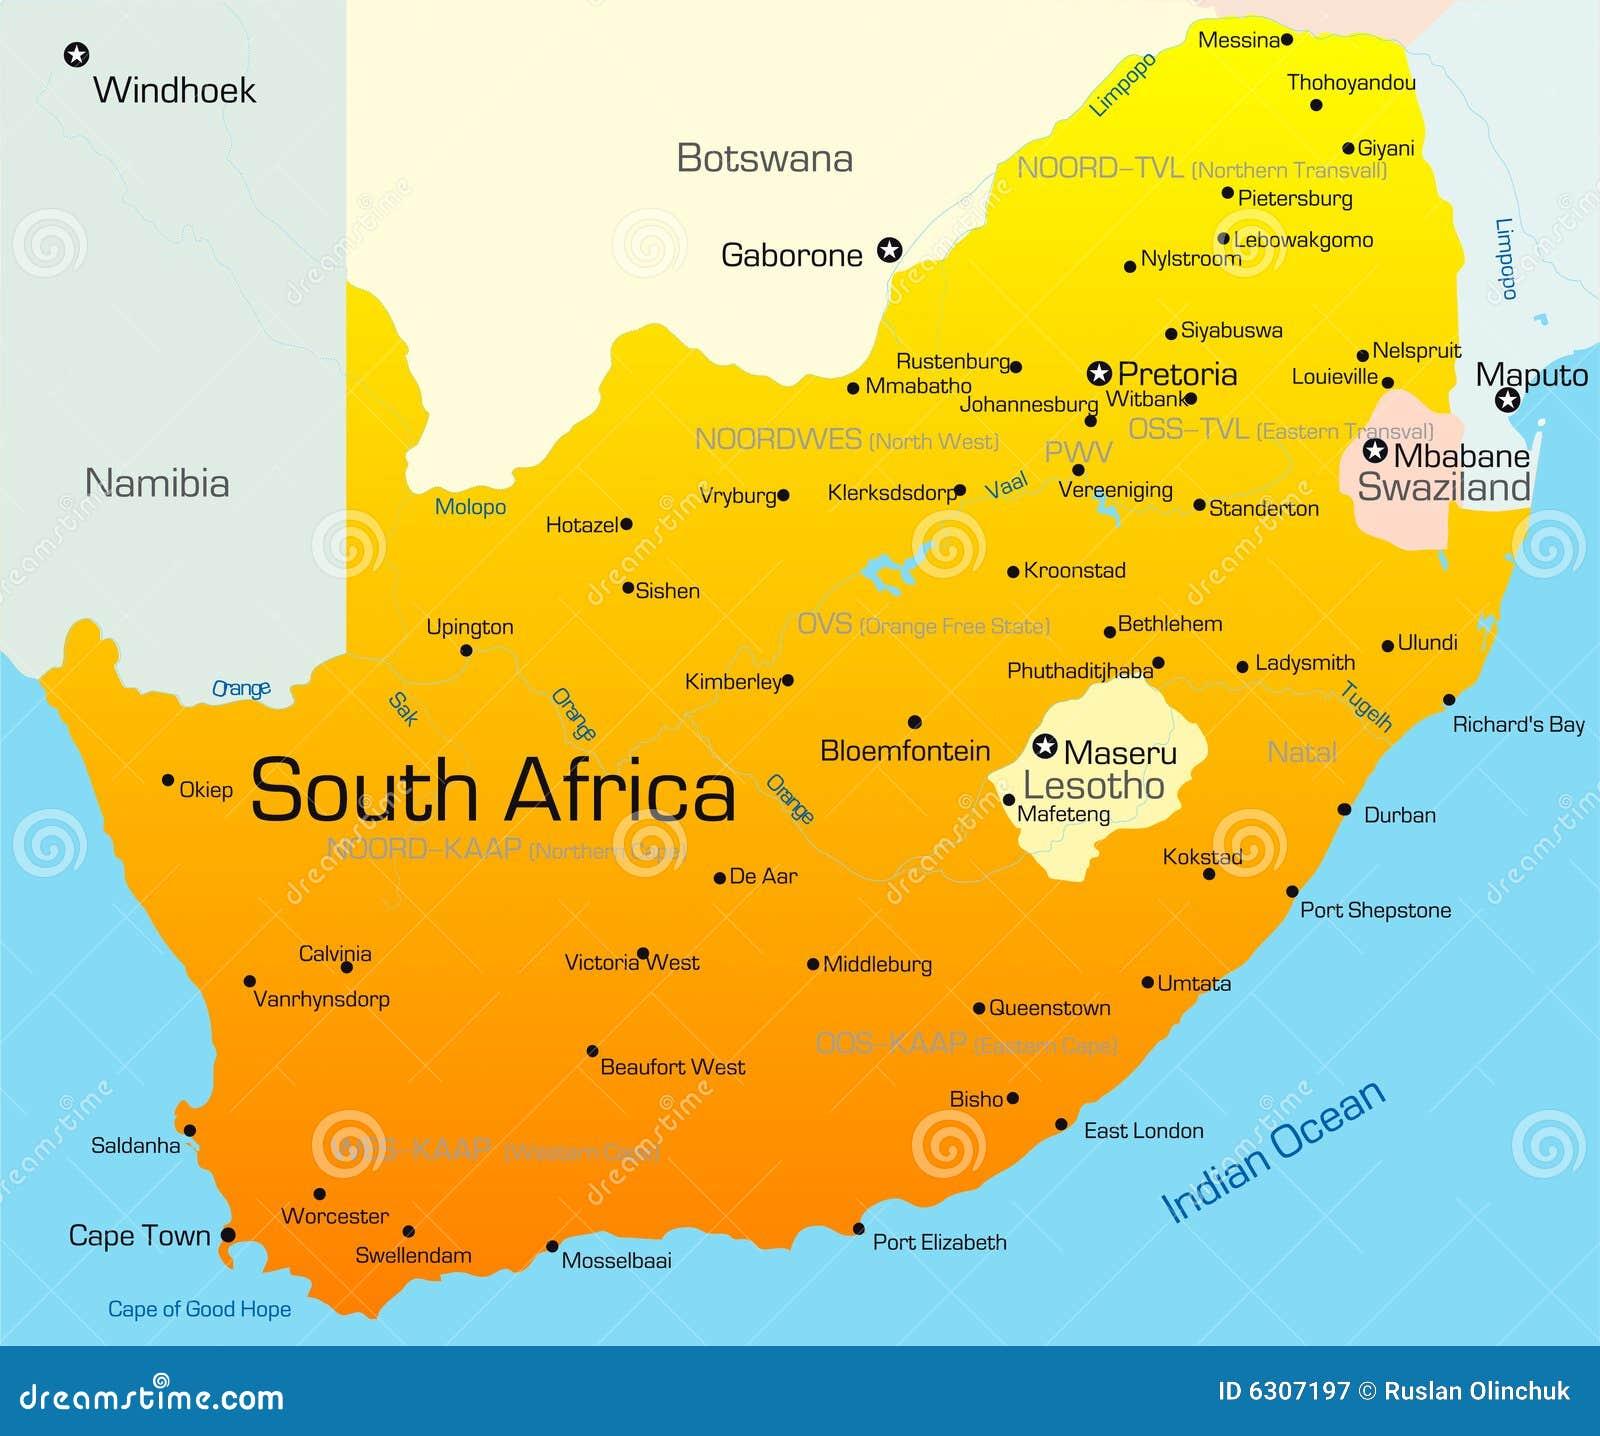 País de Suráfrica